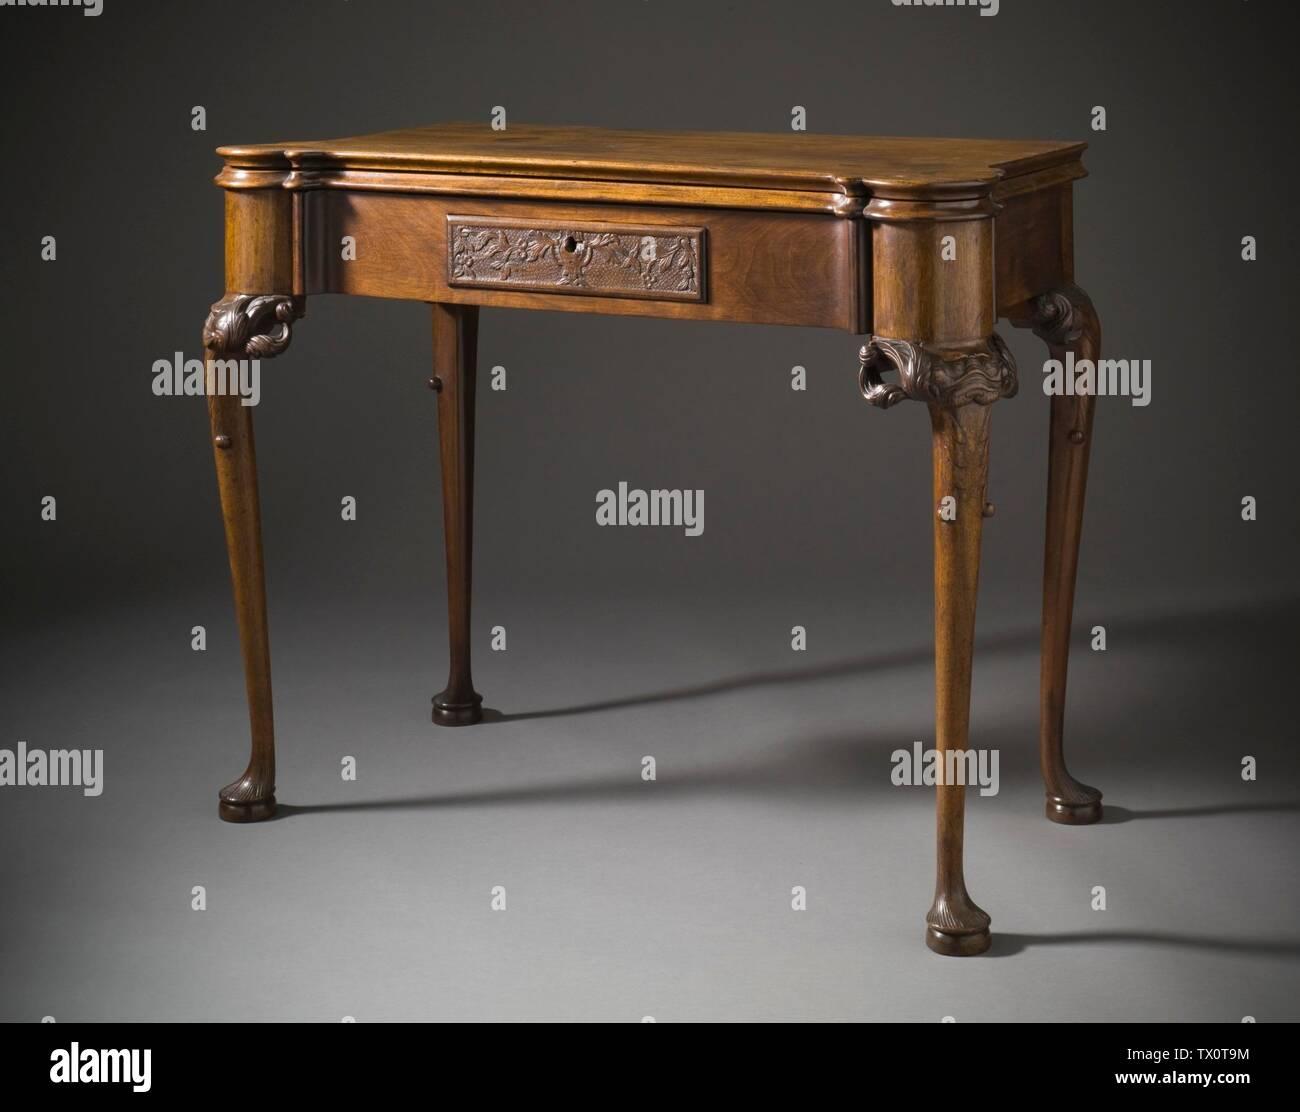 'Tarjeta de mesa con Mask-Carved rodillas (Imagen 2 de 4); en inglés: Estados Unidos, Massachusetts, Boston, circa 1750; muebles muebles de nogal, pinares con forro de tapete verde original 28 1/4 x 37 1/8 x 25 1/2 pulg. (71,76 x 94,30 x 64,77 cm) de regalo de la Sra. Murray Braunfeld (M.2006.51.2) Artes Decorativas y diseño; circa 1750 fecha QS:P571,+1750-00-00T00:00:00Z/9,P1480,Q5727902; ' Imagen De Stock